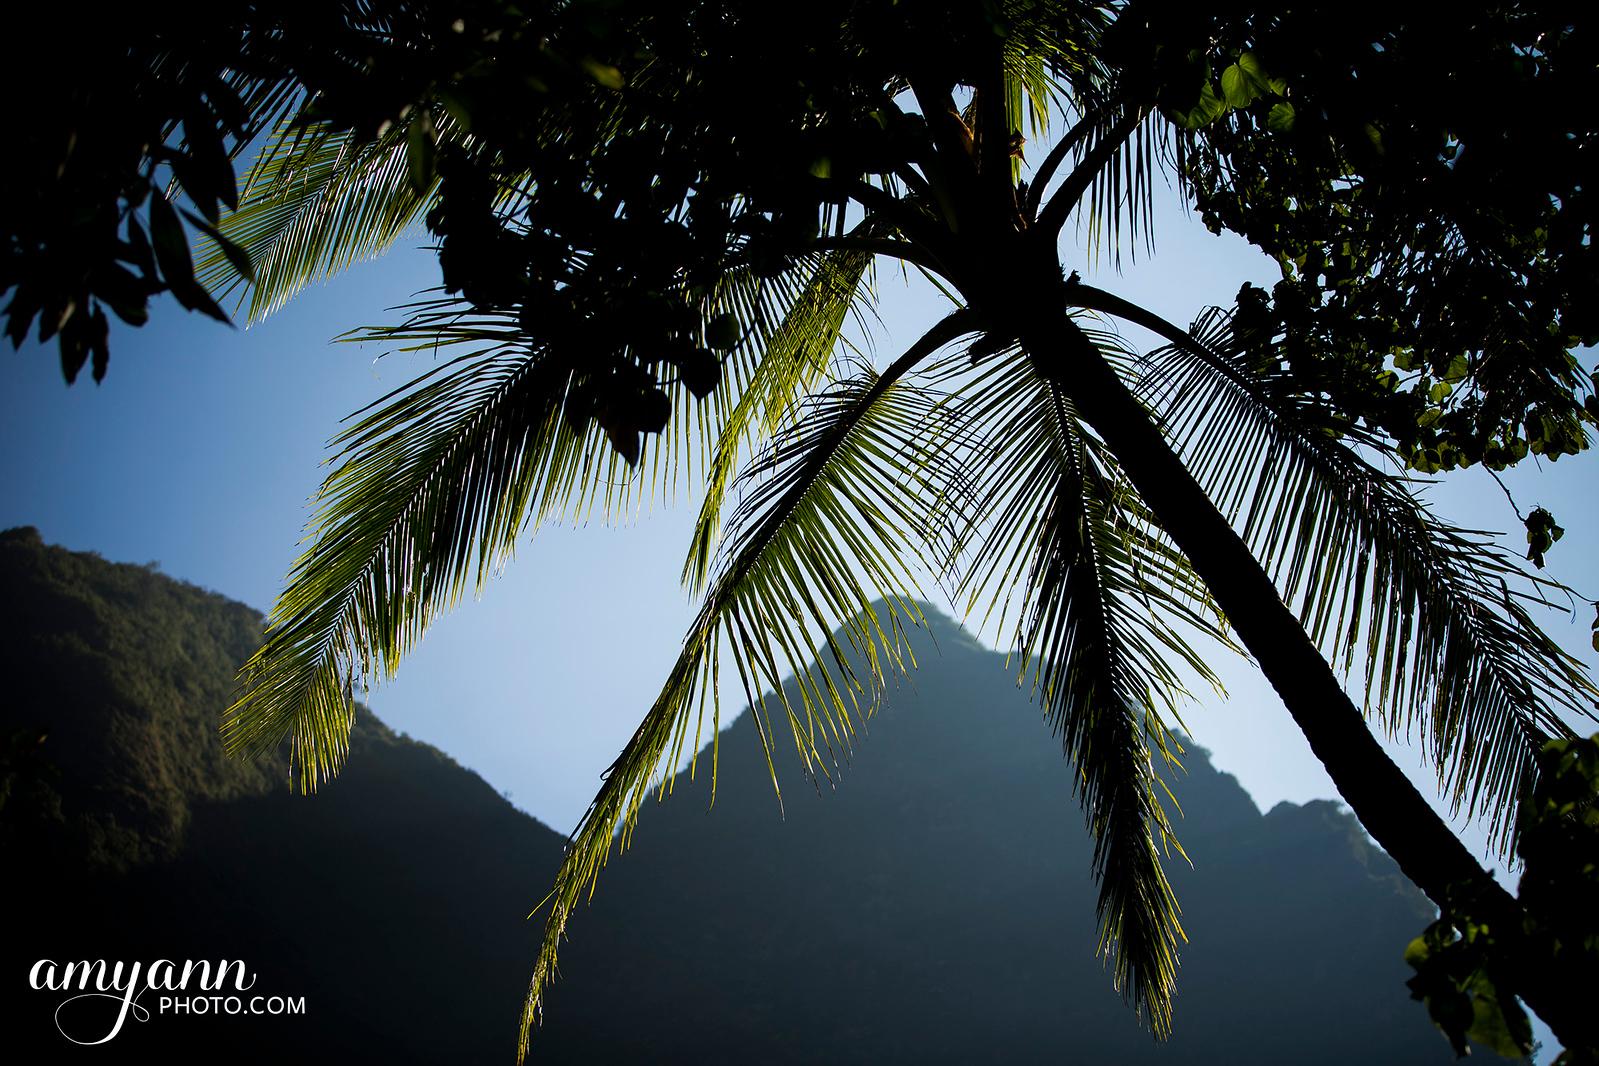 hawaii_amyannphoto_81